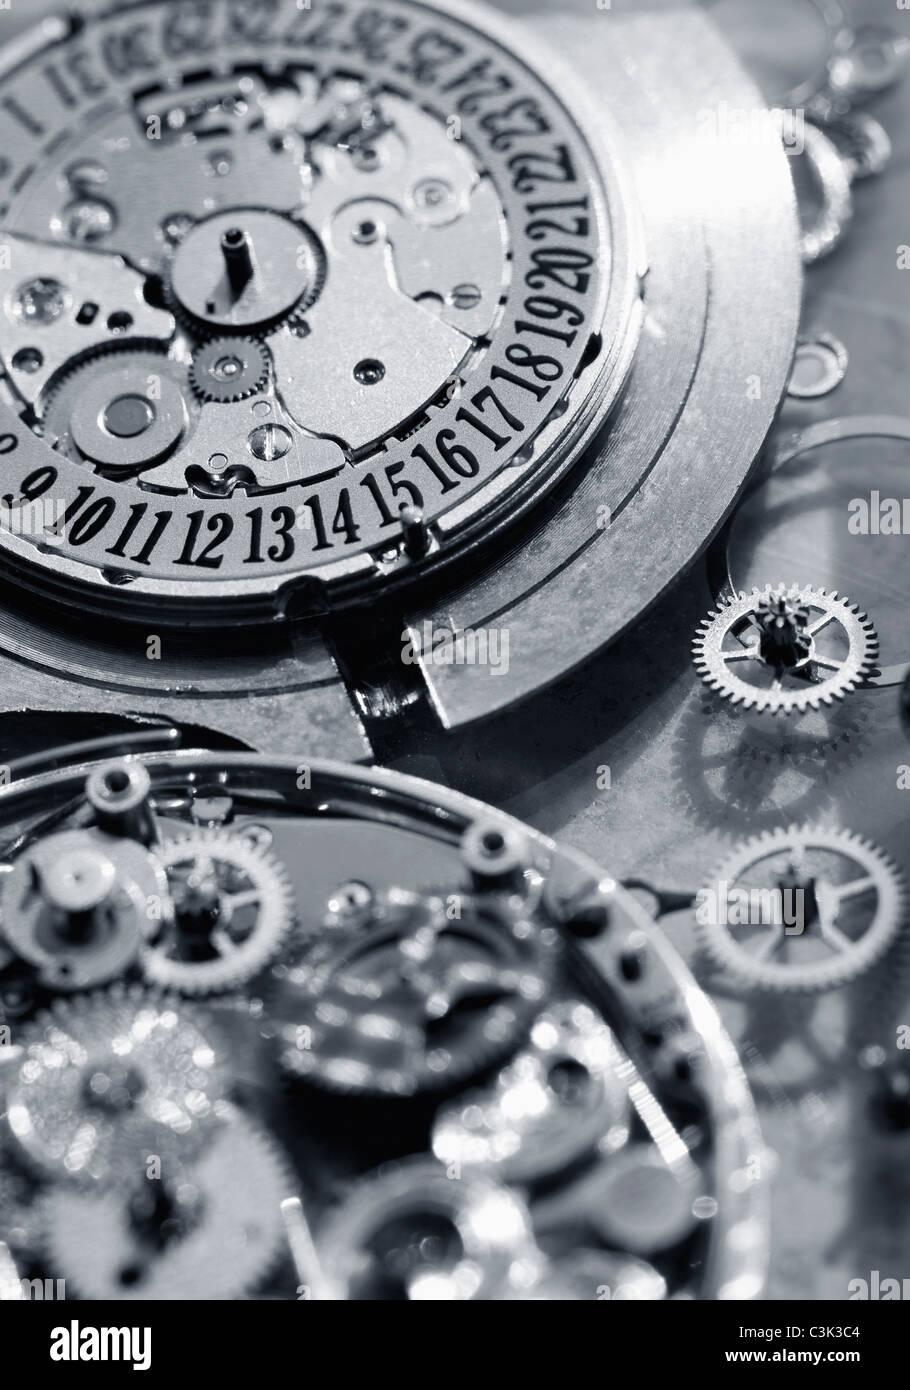 Innenteile der Uhr, Nahaufnahme Stockbild